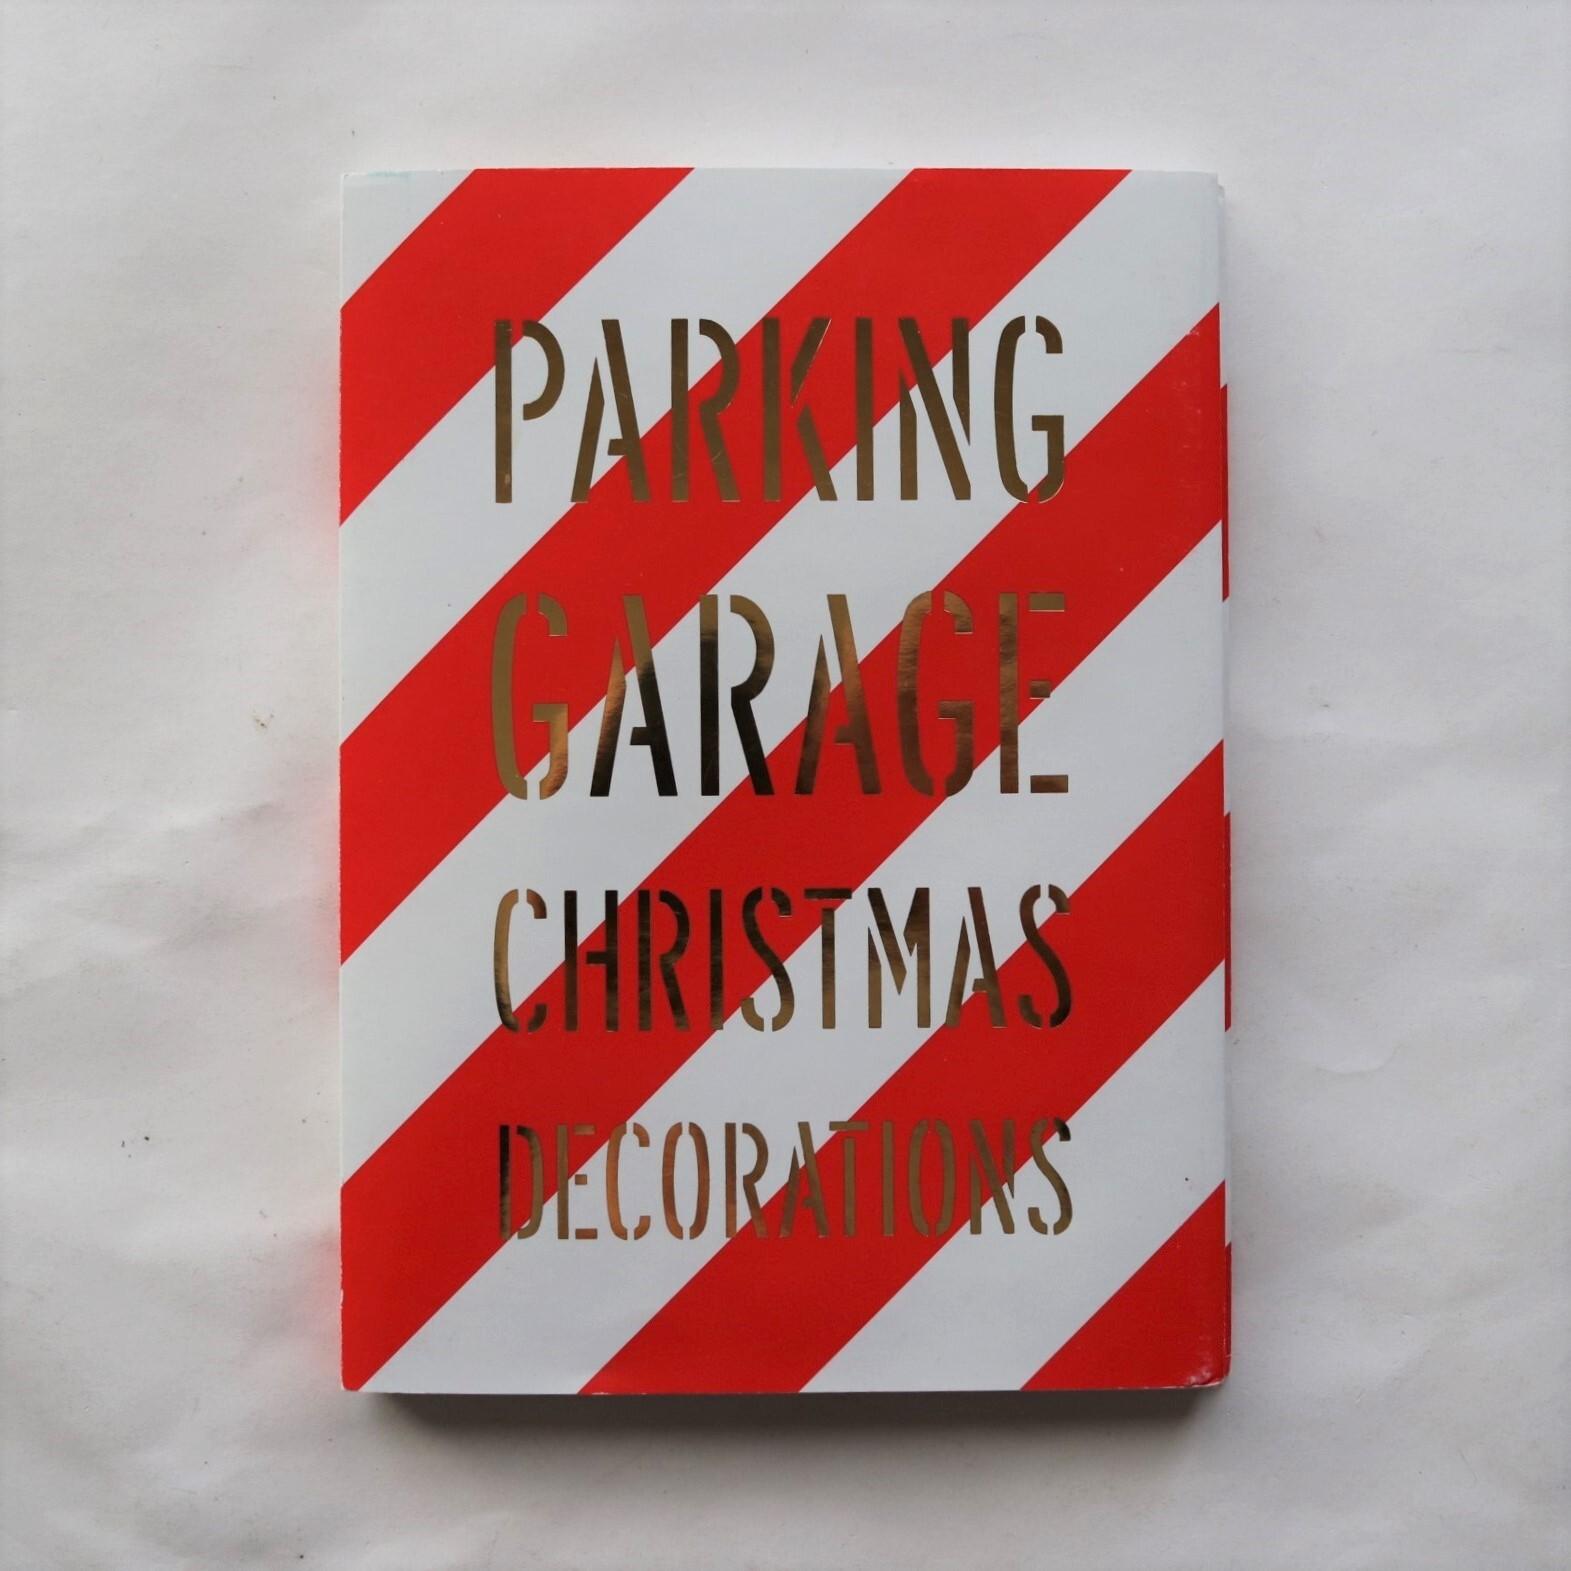 PARKING GARAGE CHRISTMAS DECORATION / Andy Spade